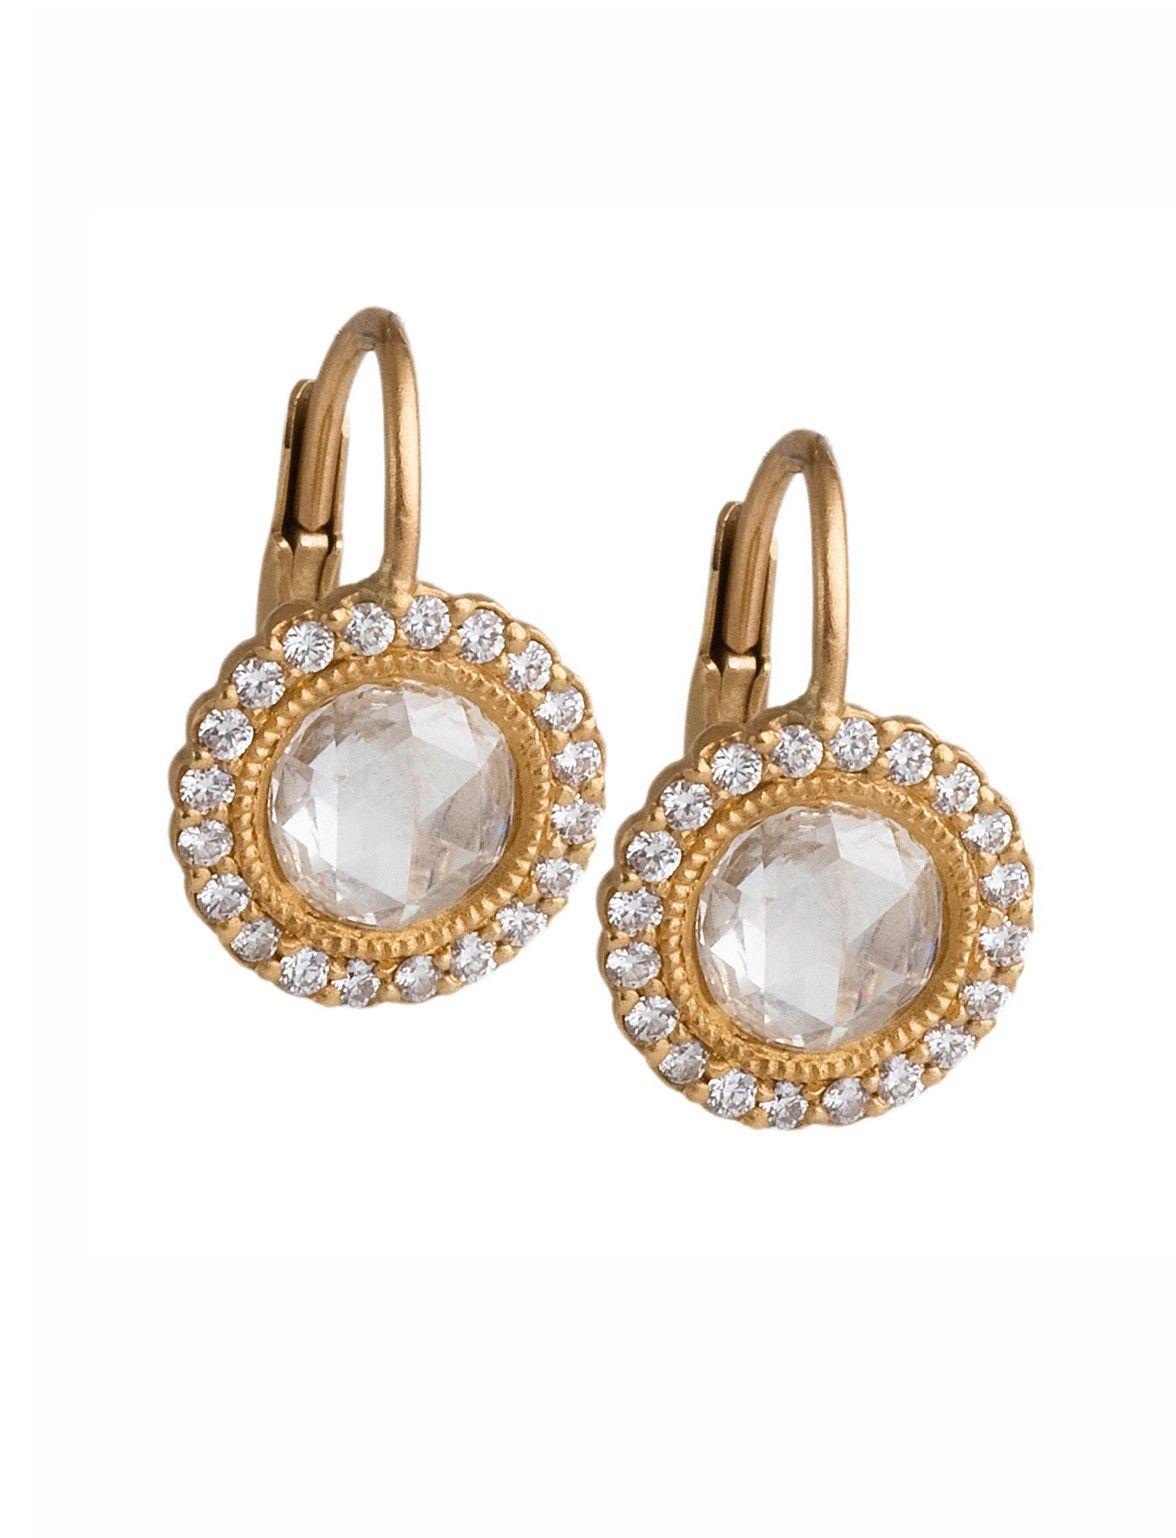 Jamie Wolf 18k Small Diamond Vine Drop Earrings BKturk